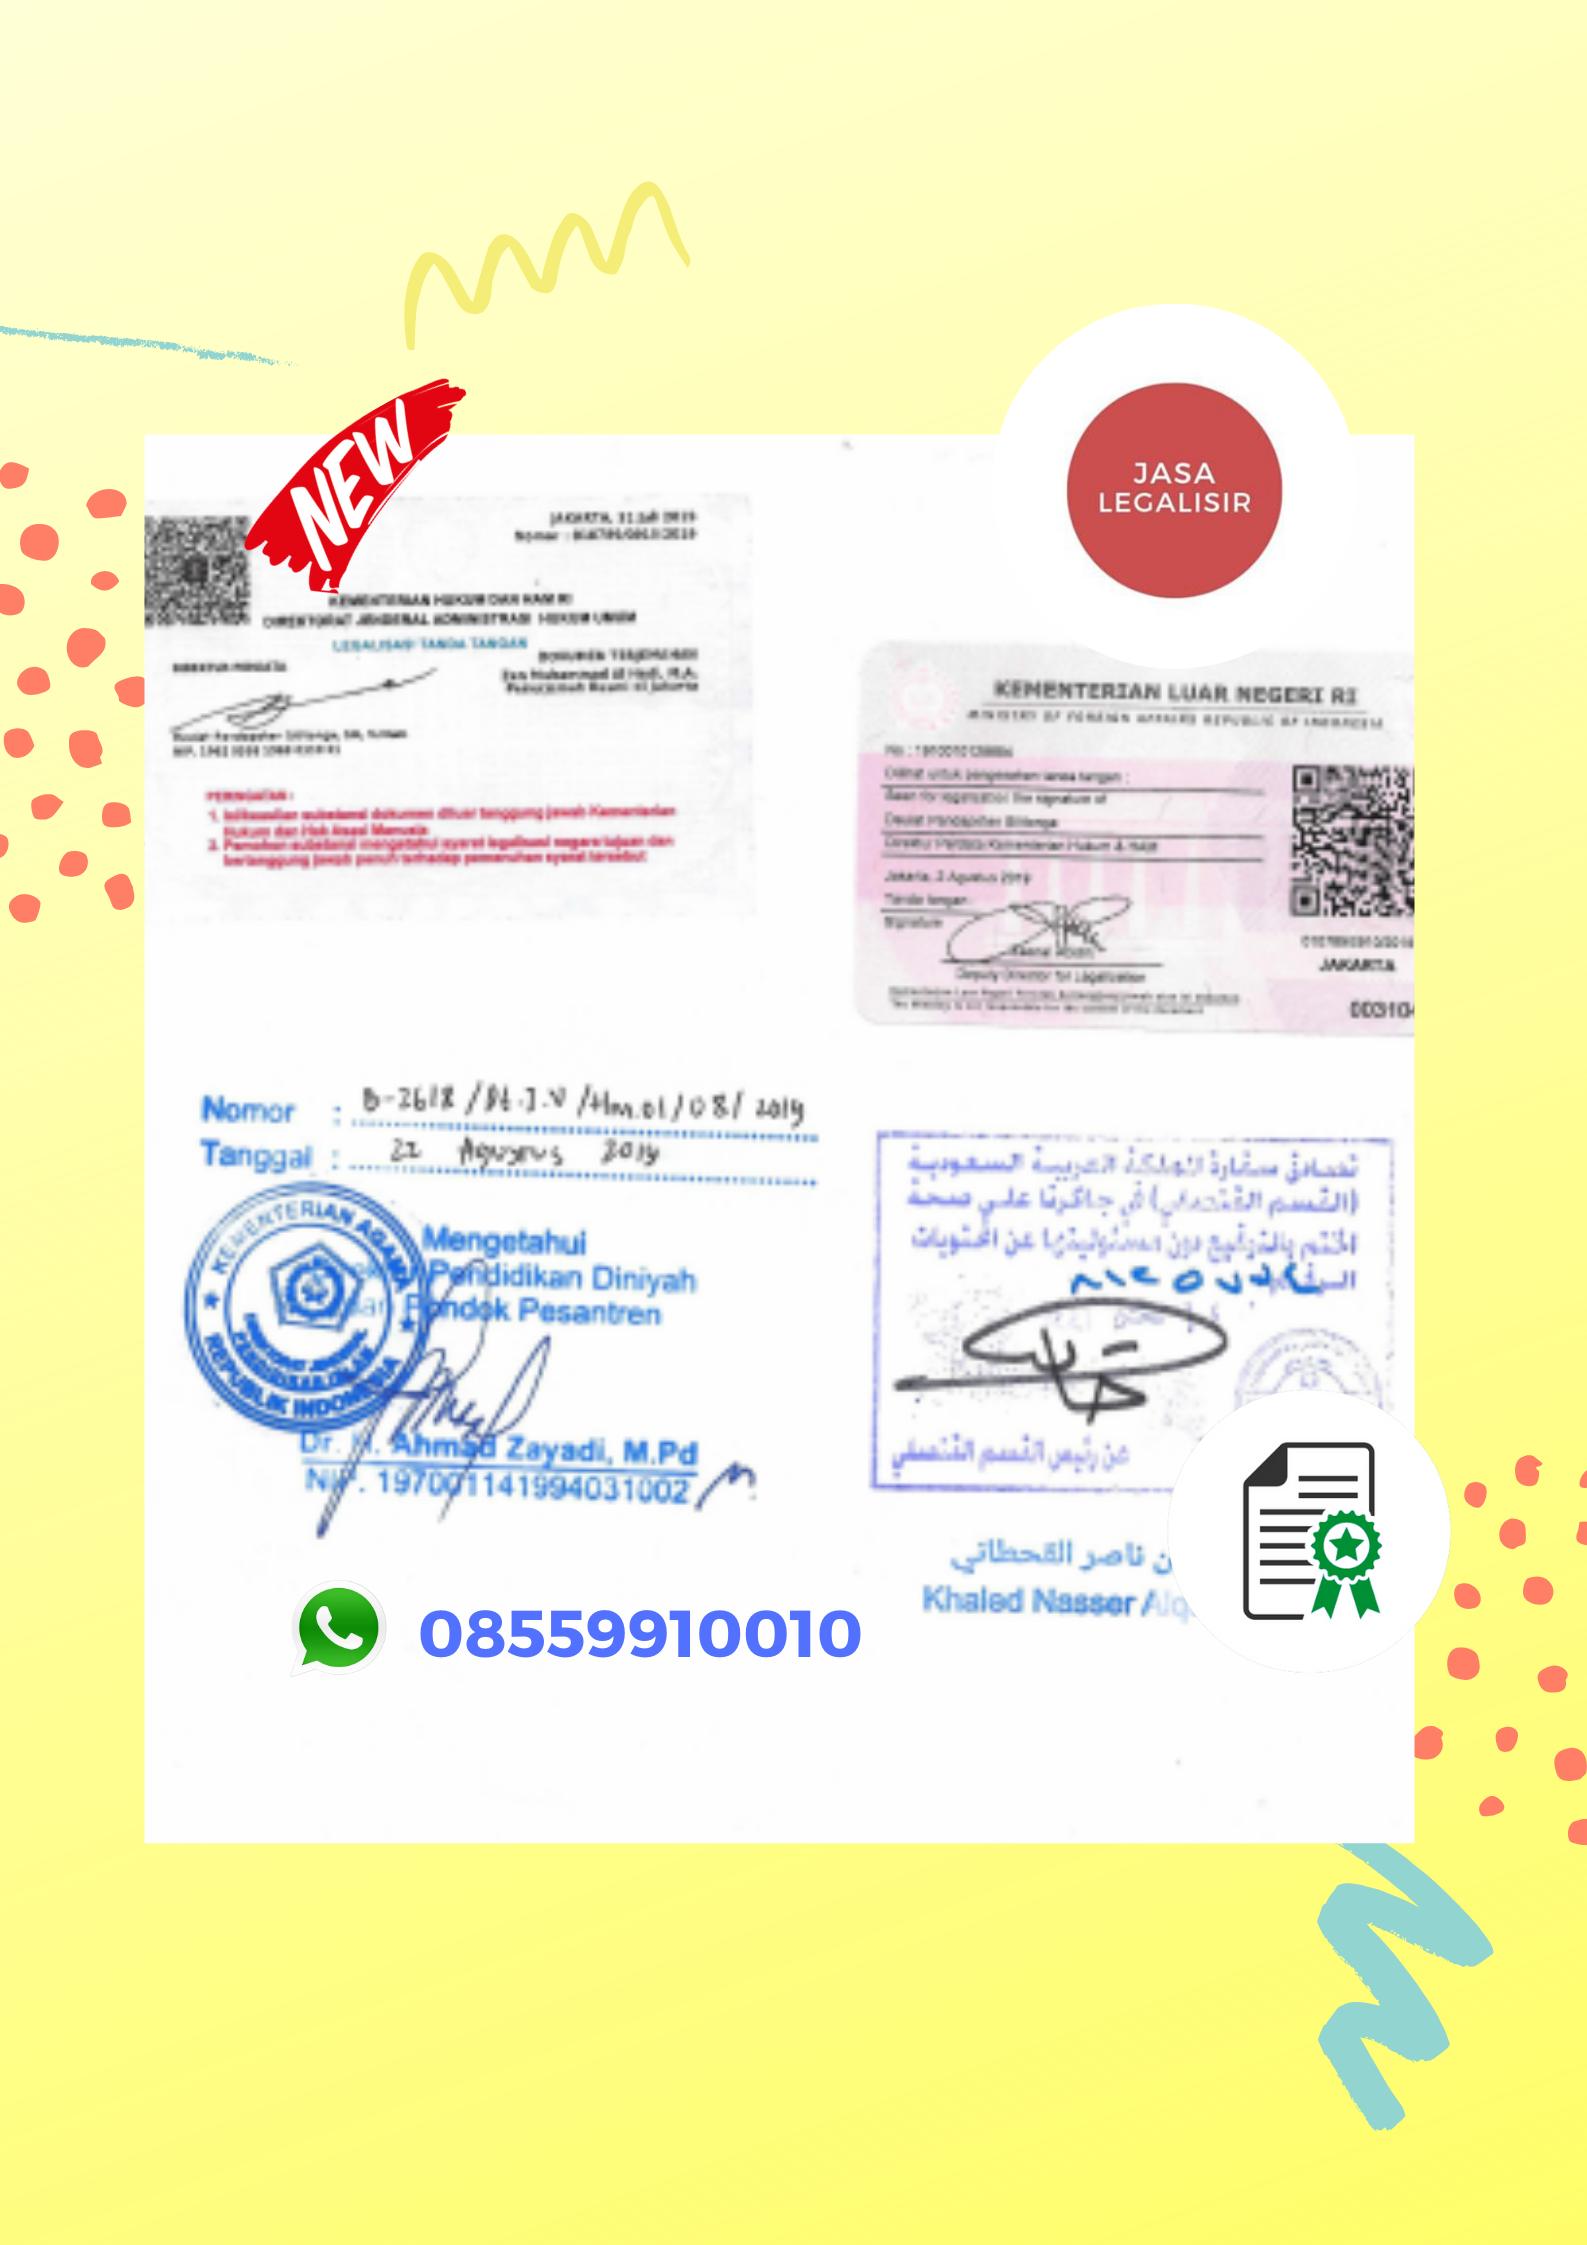 Jasa Legalisasi Saudi Arabia || 08559910010